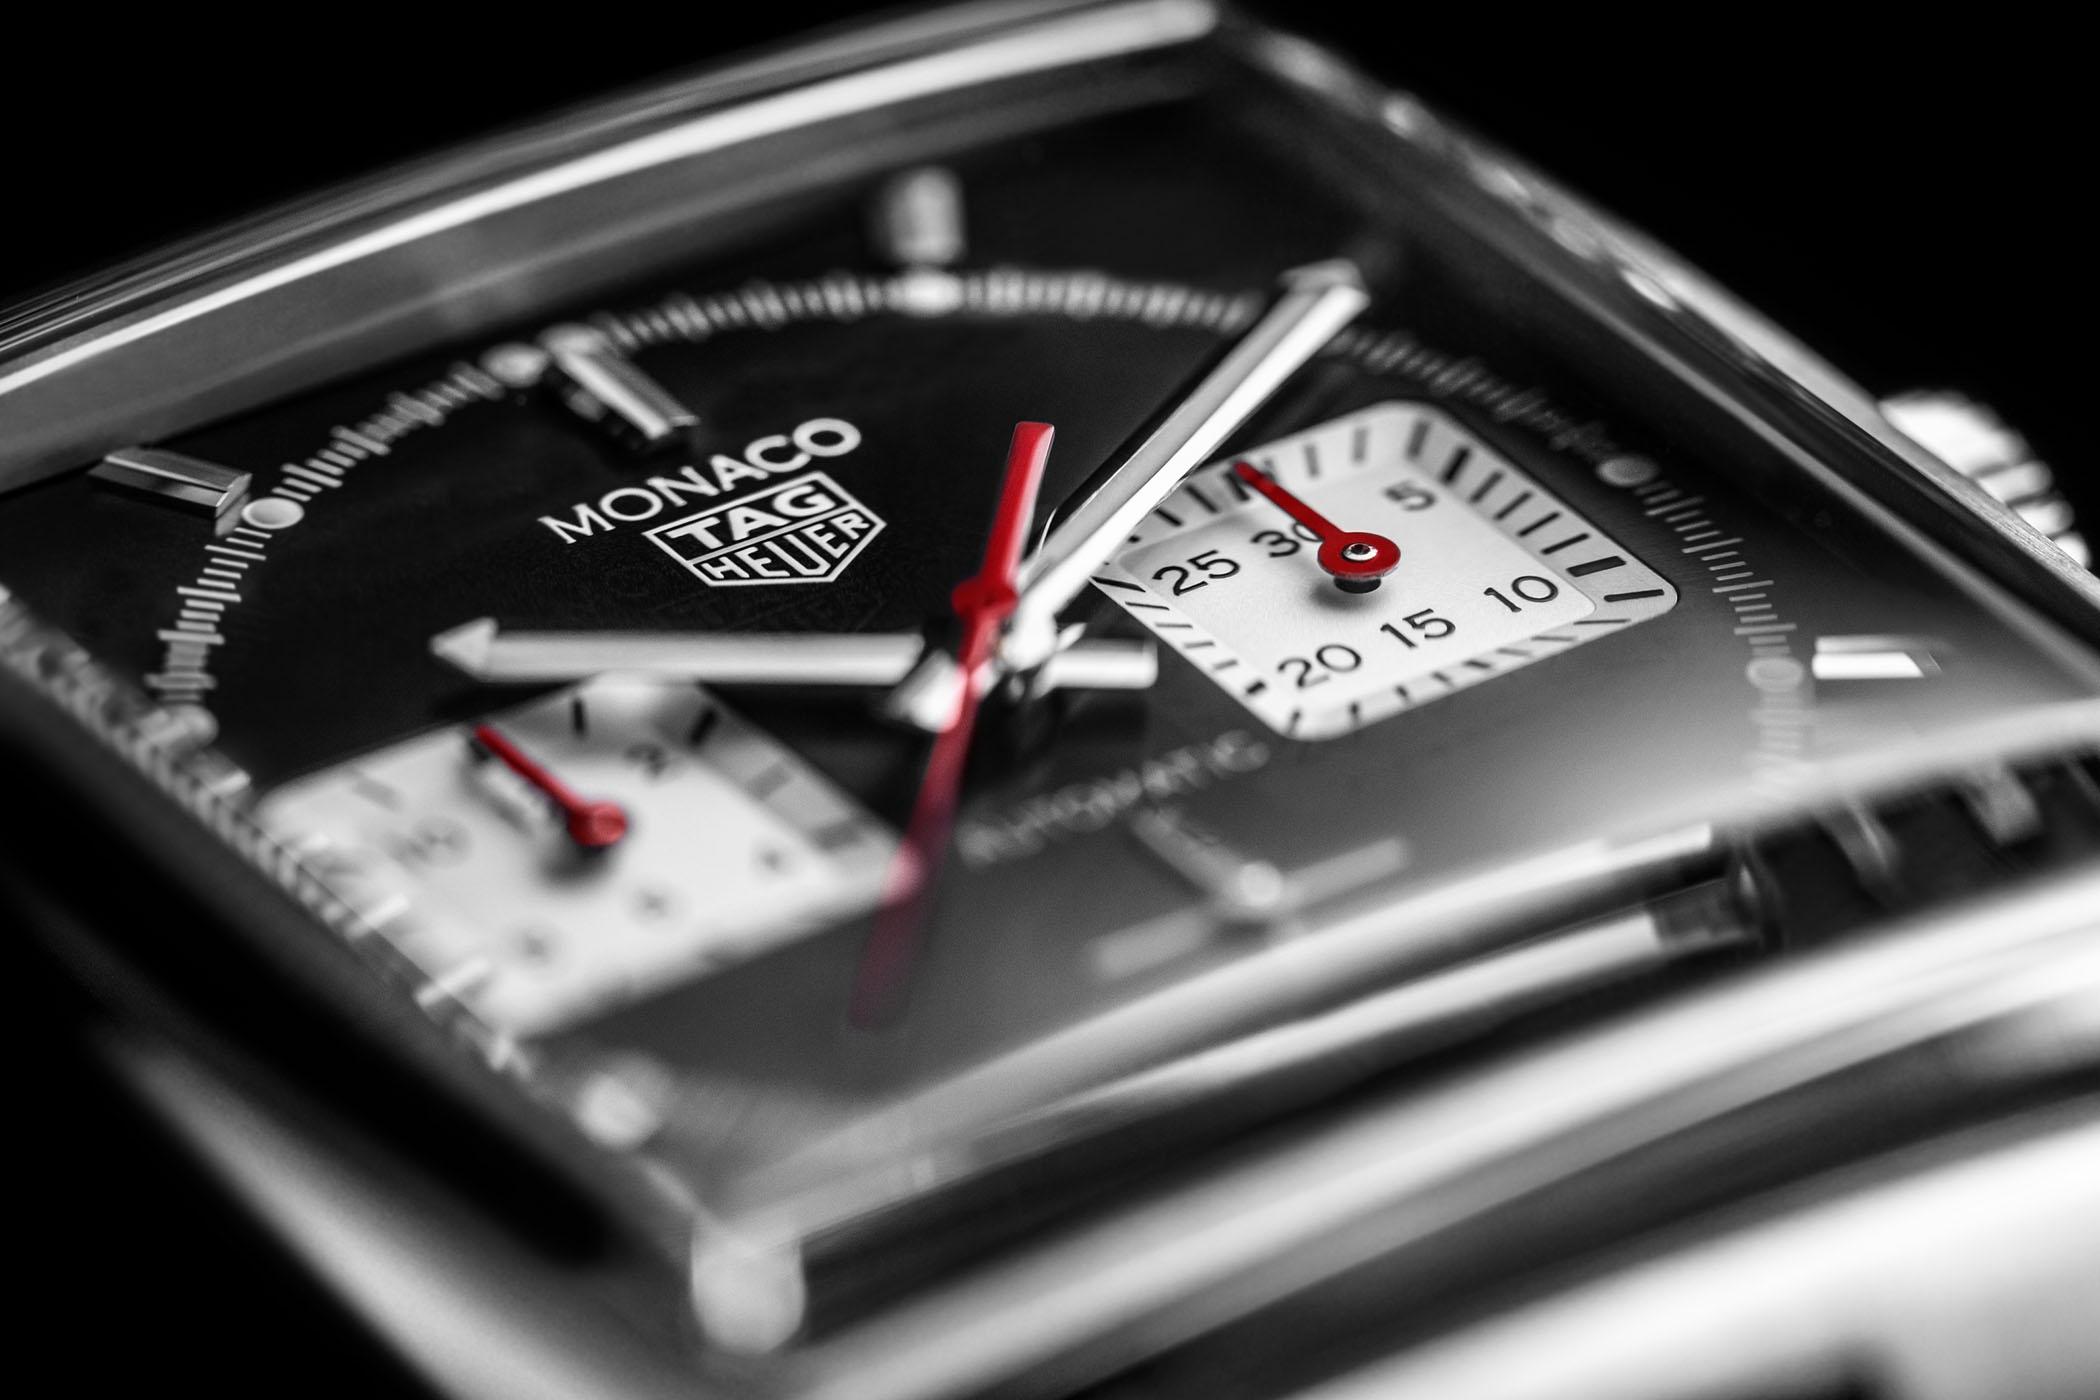 TAG Heuer Monaco Calibre Heuer 02 Black Steel bracelet - CBL2113.BA0644